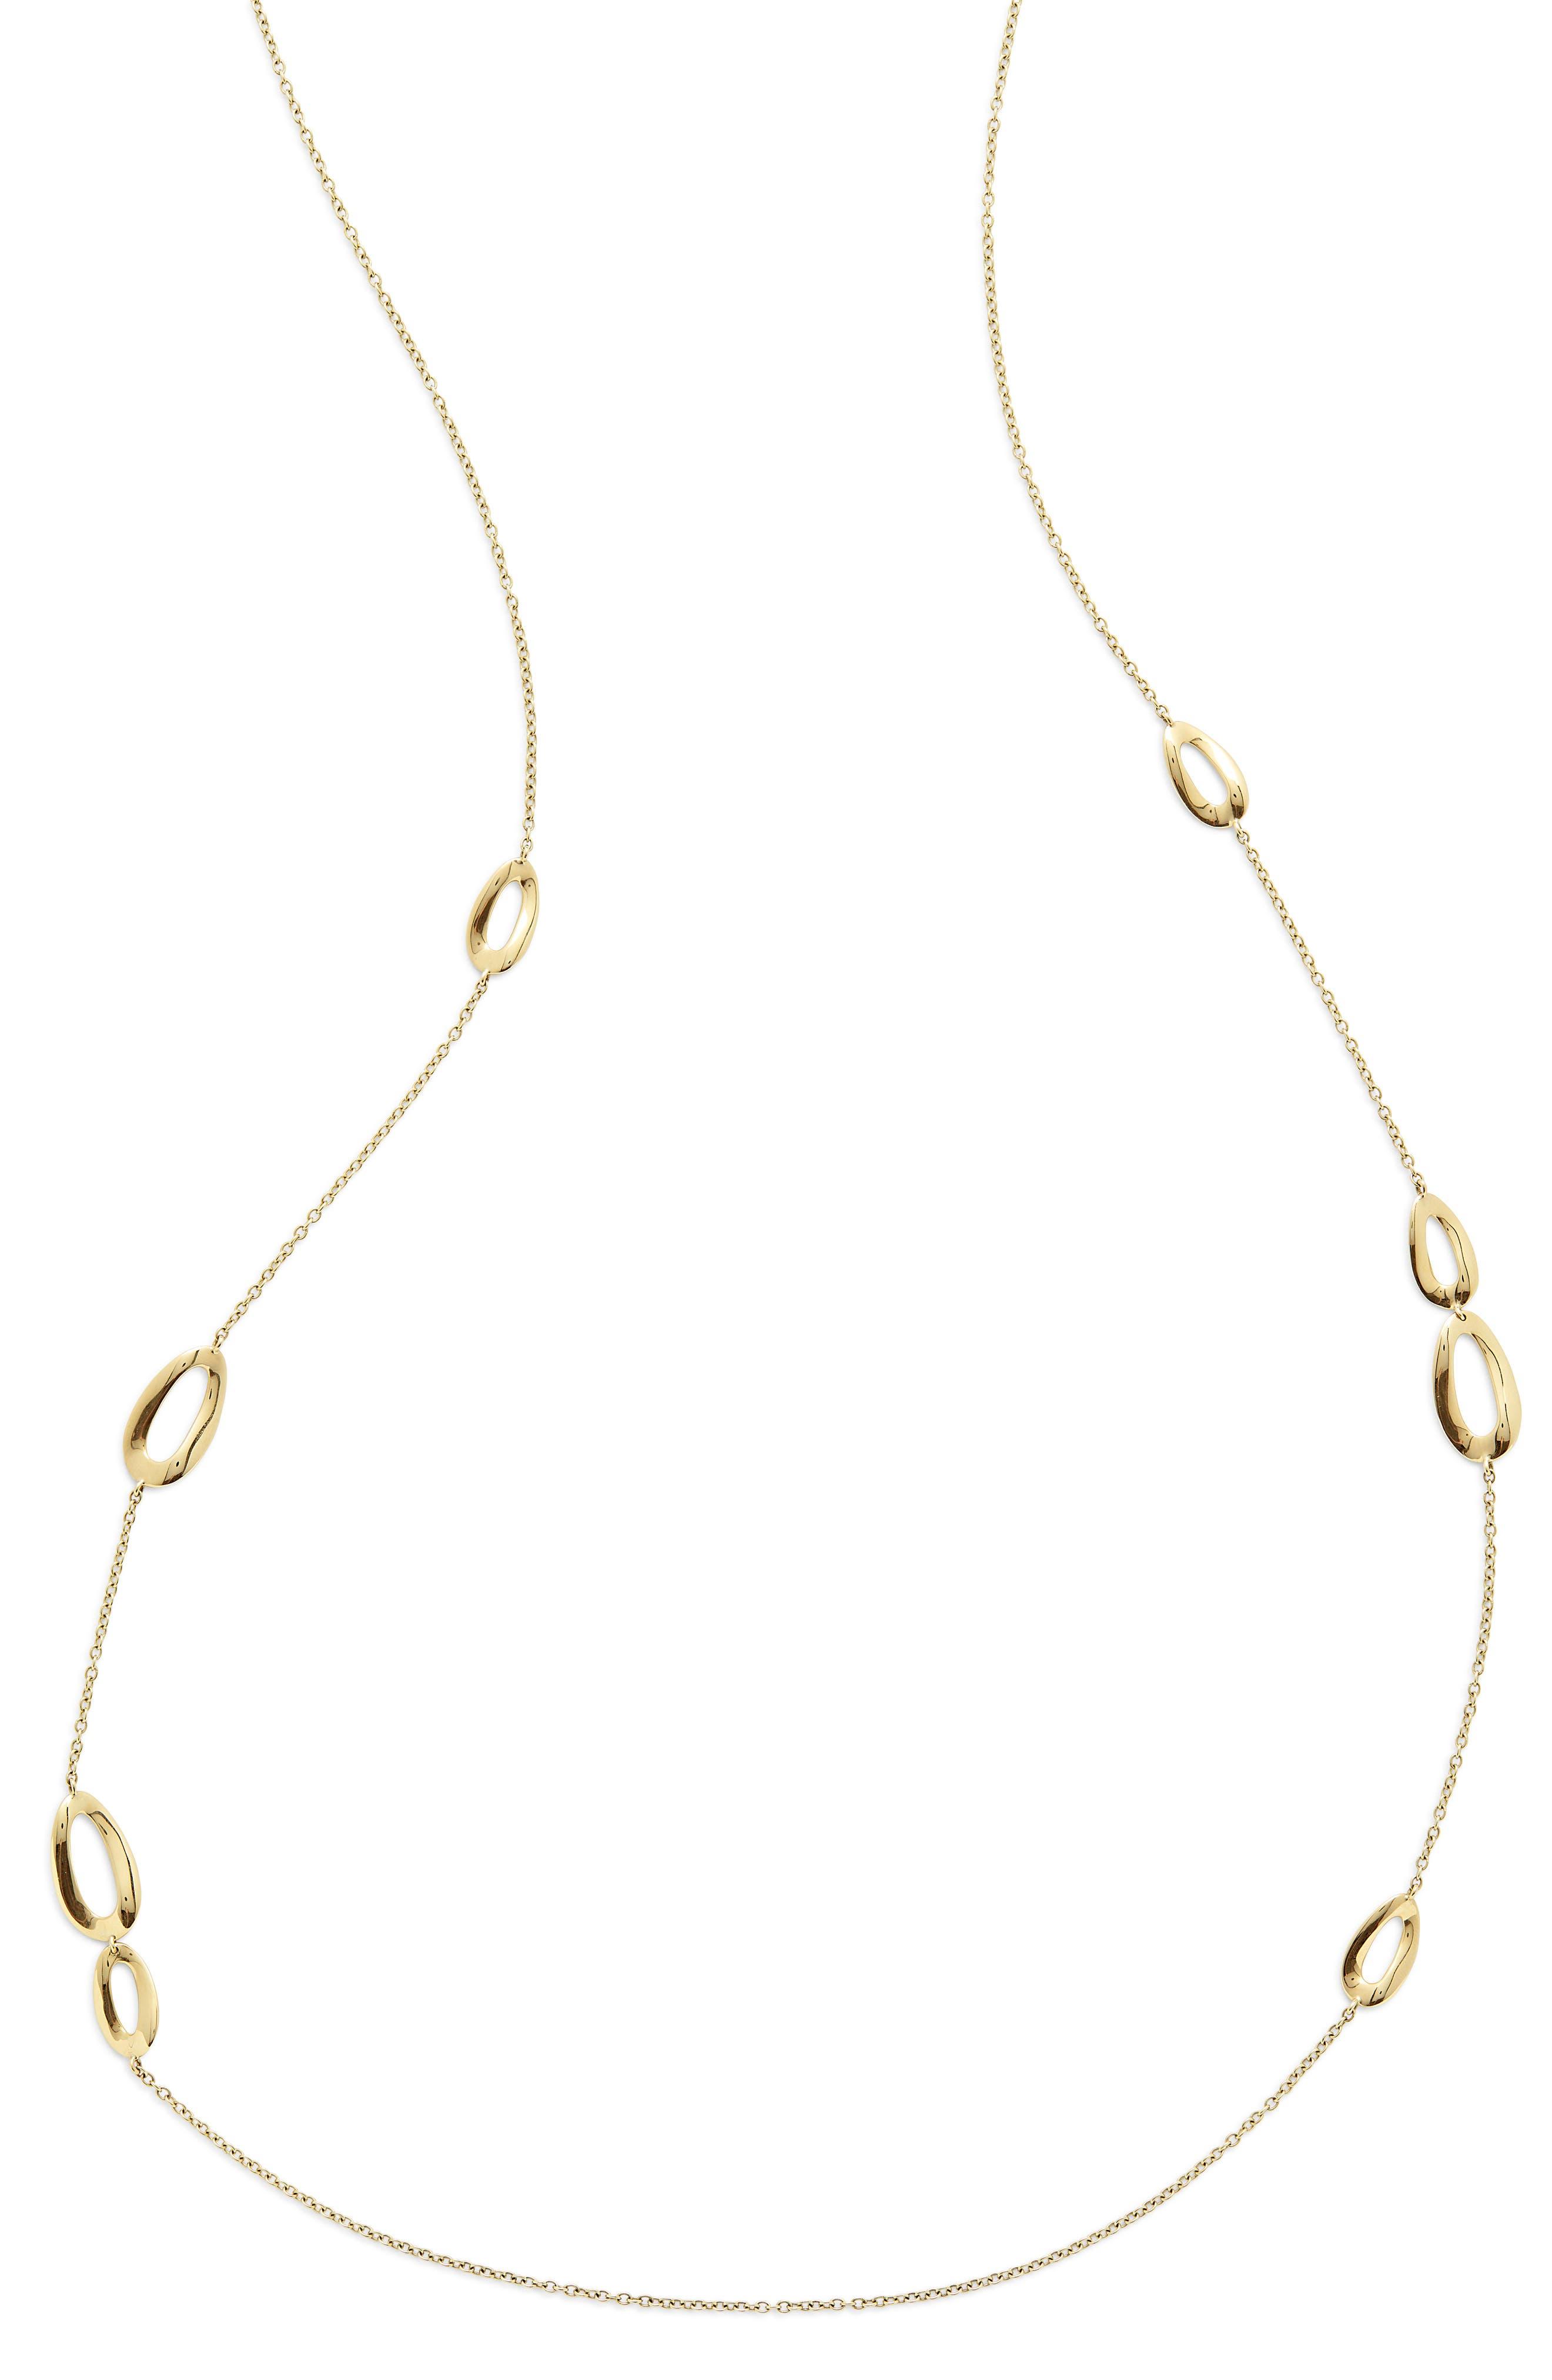 Cherish Bond 18K Gold Station Necklace,                         Main,                         color, YELLOW GOLD